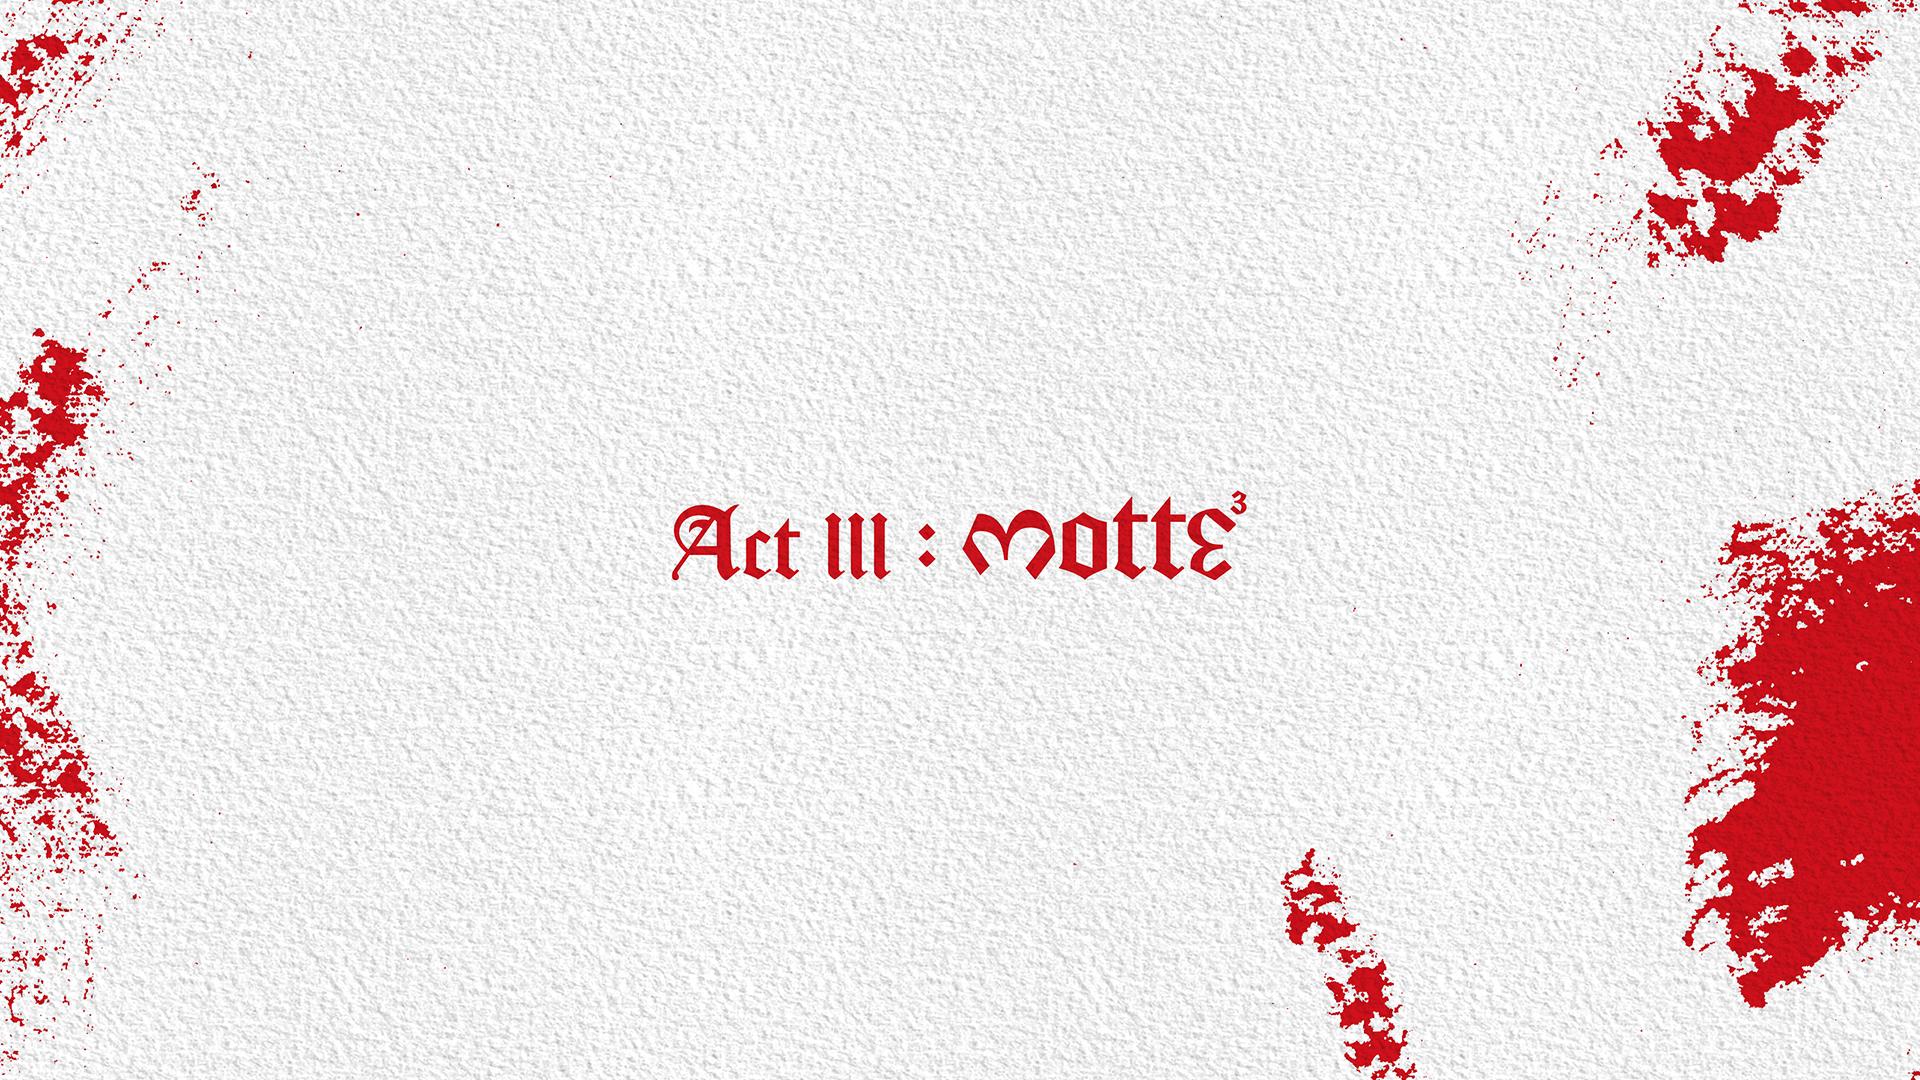 G-DRAGON 2017 CONCERT <ACT III, M.O.T.T.E> IN SEOUL DVD